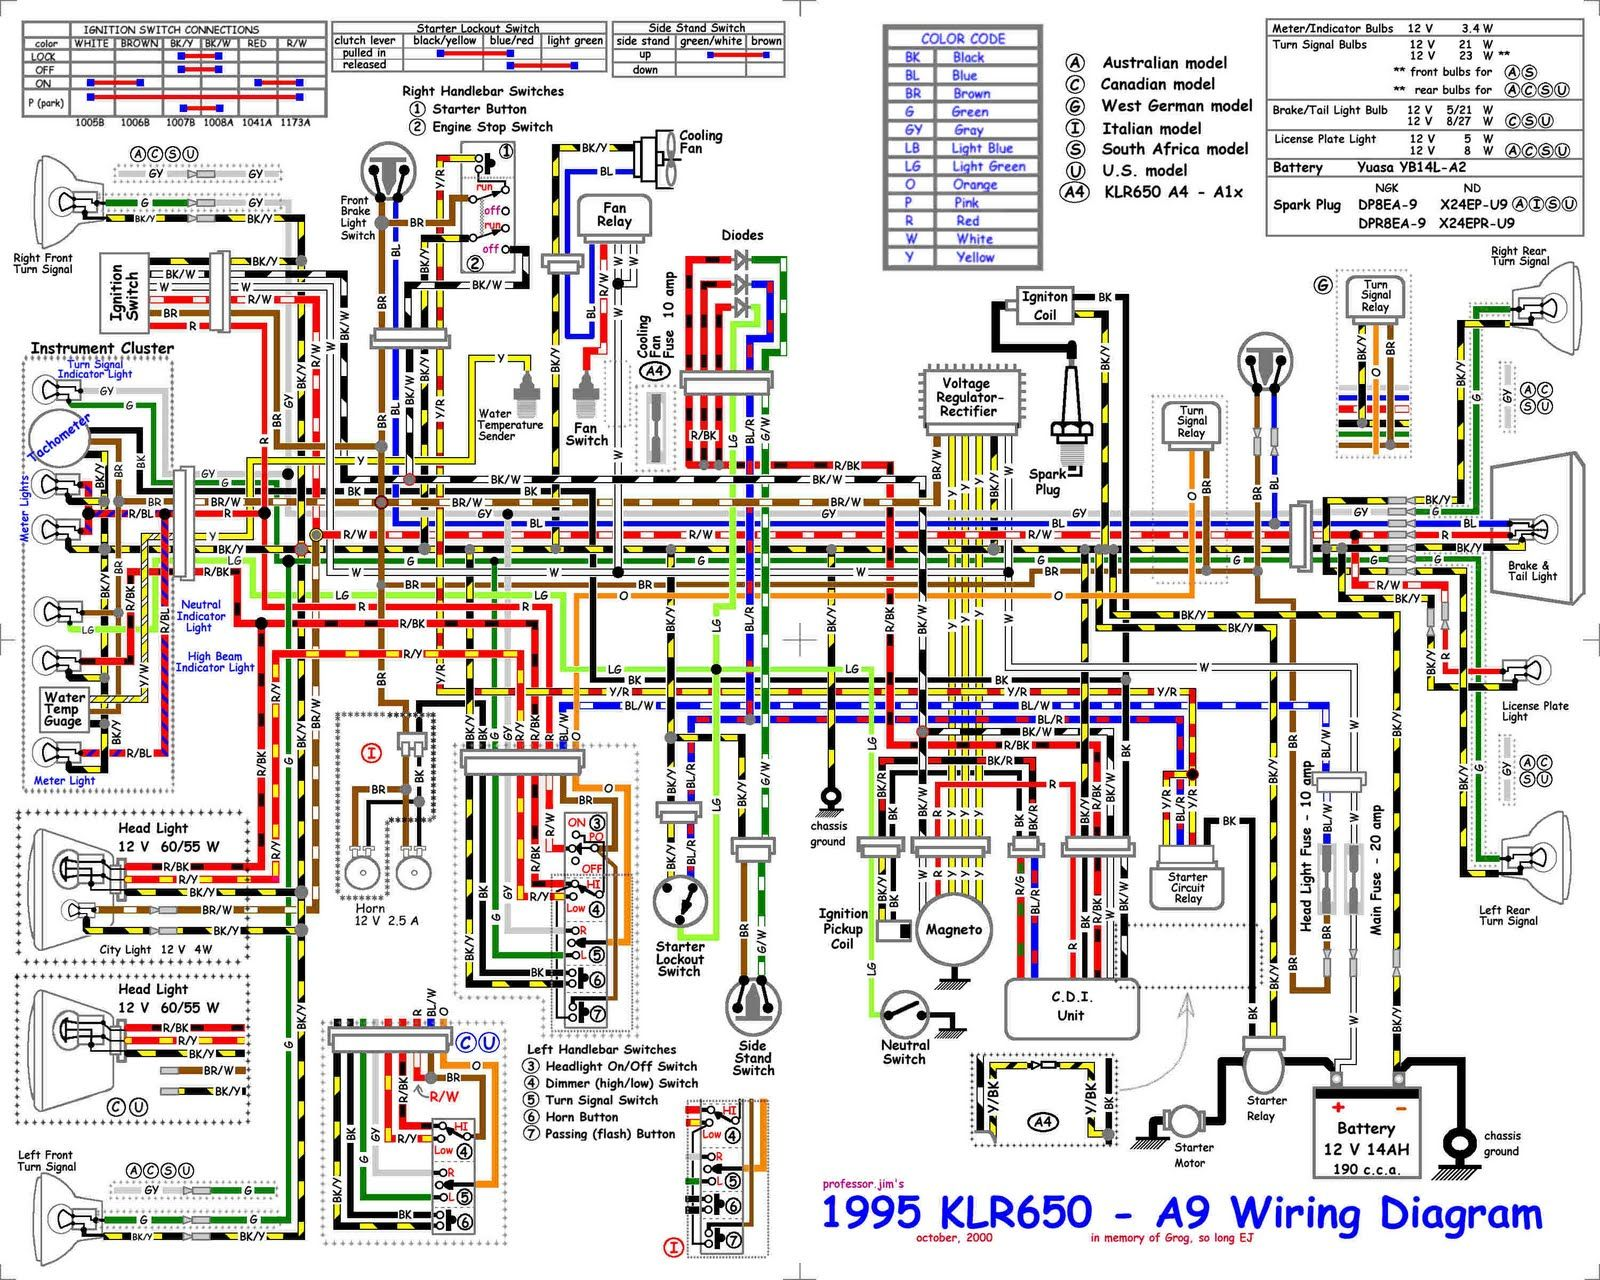 Howell Electric Motors Wiring Diagram